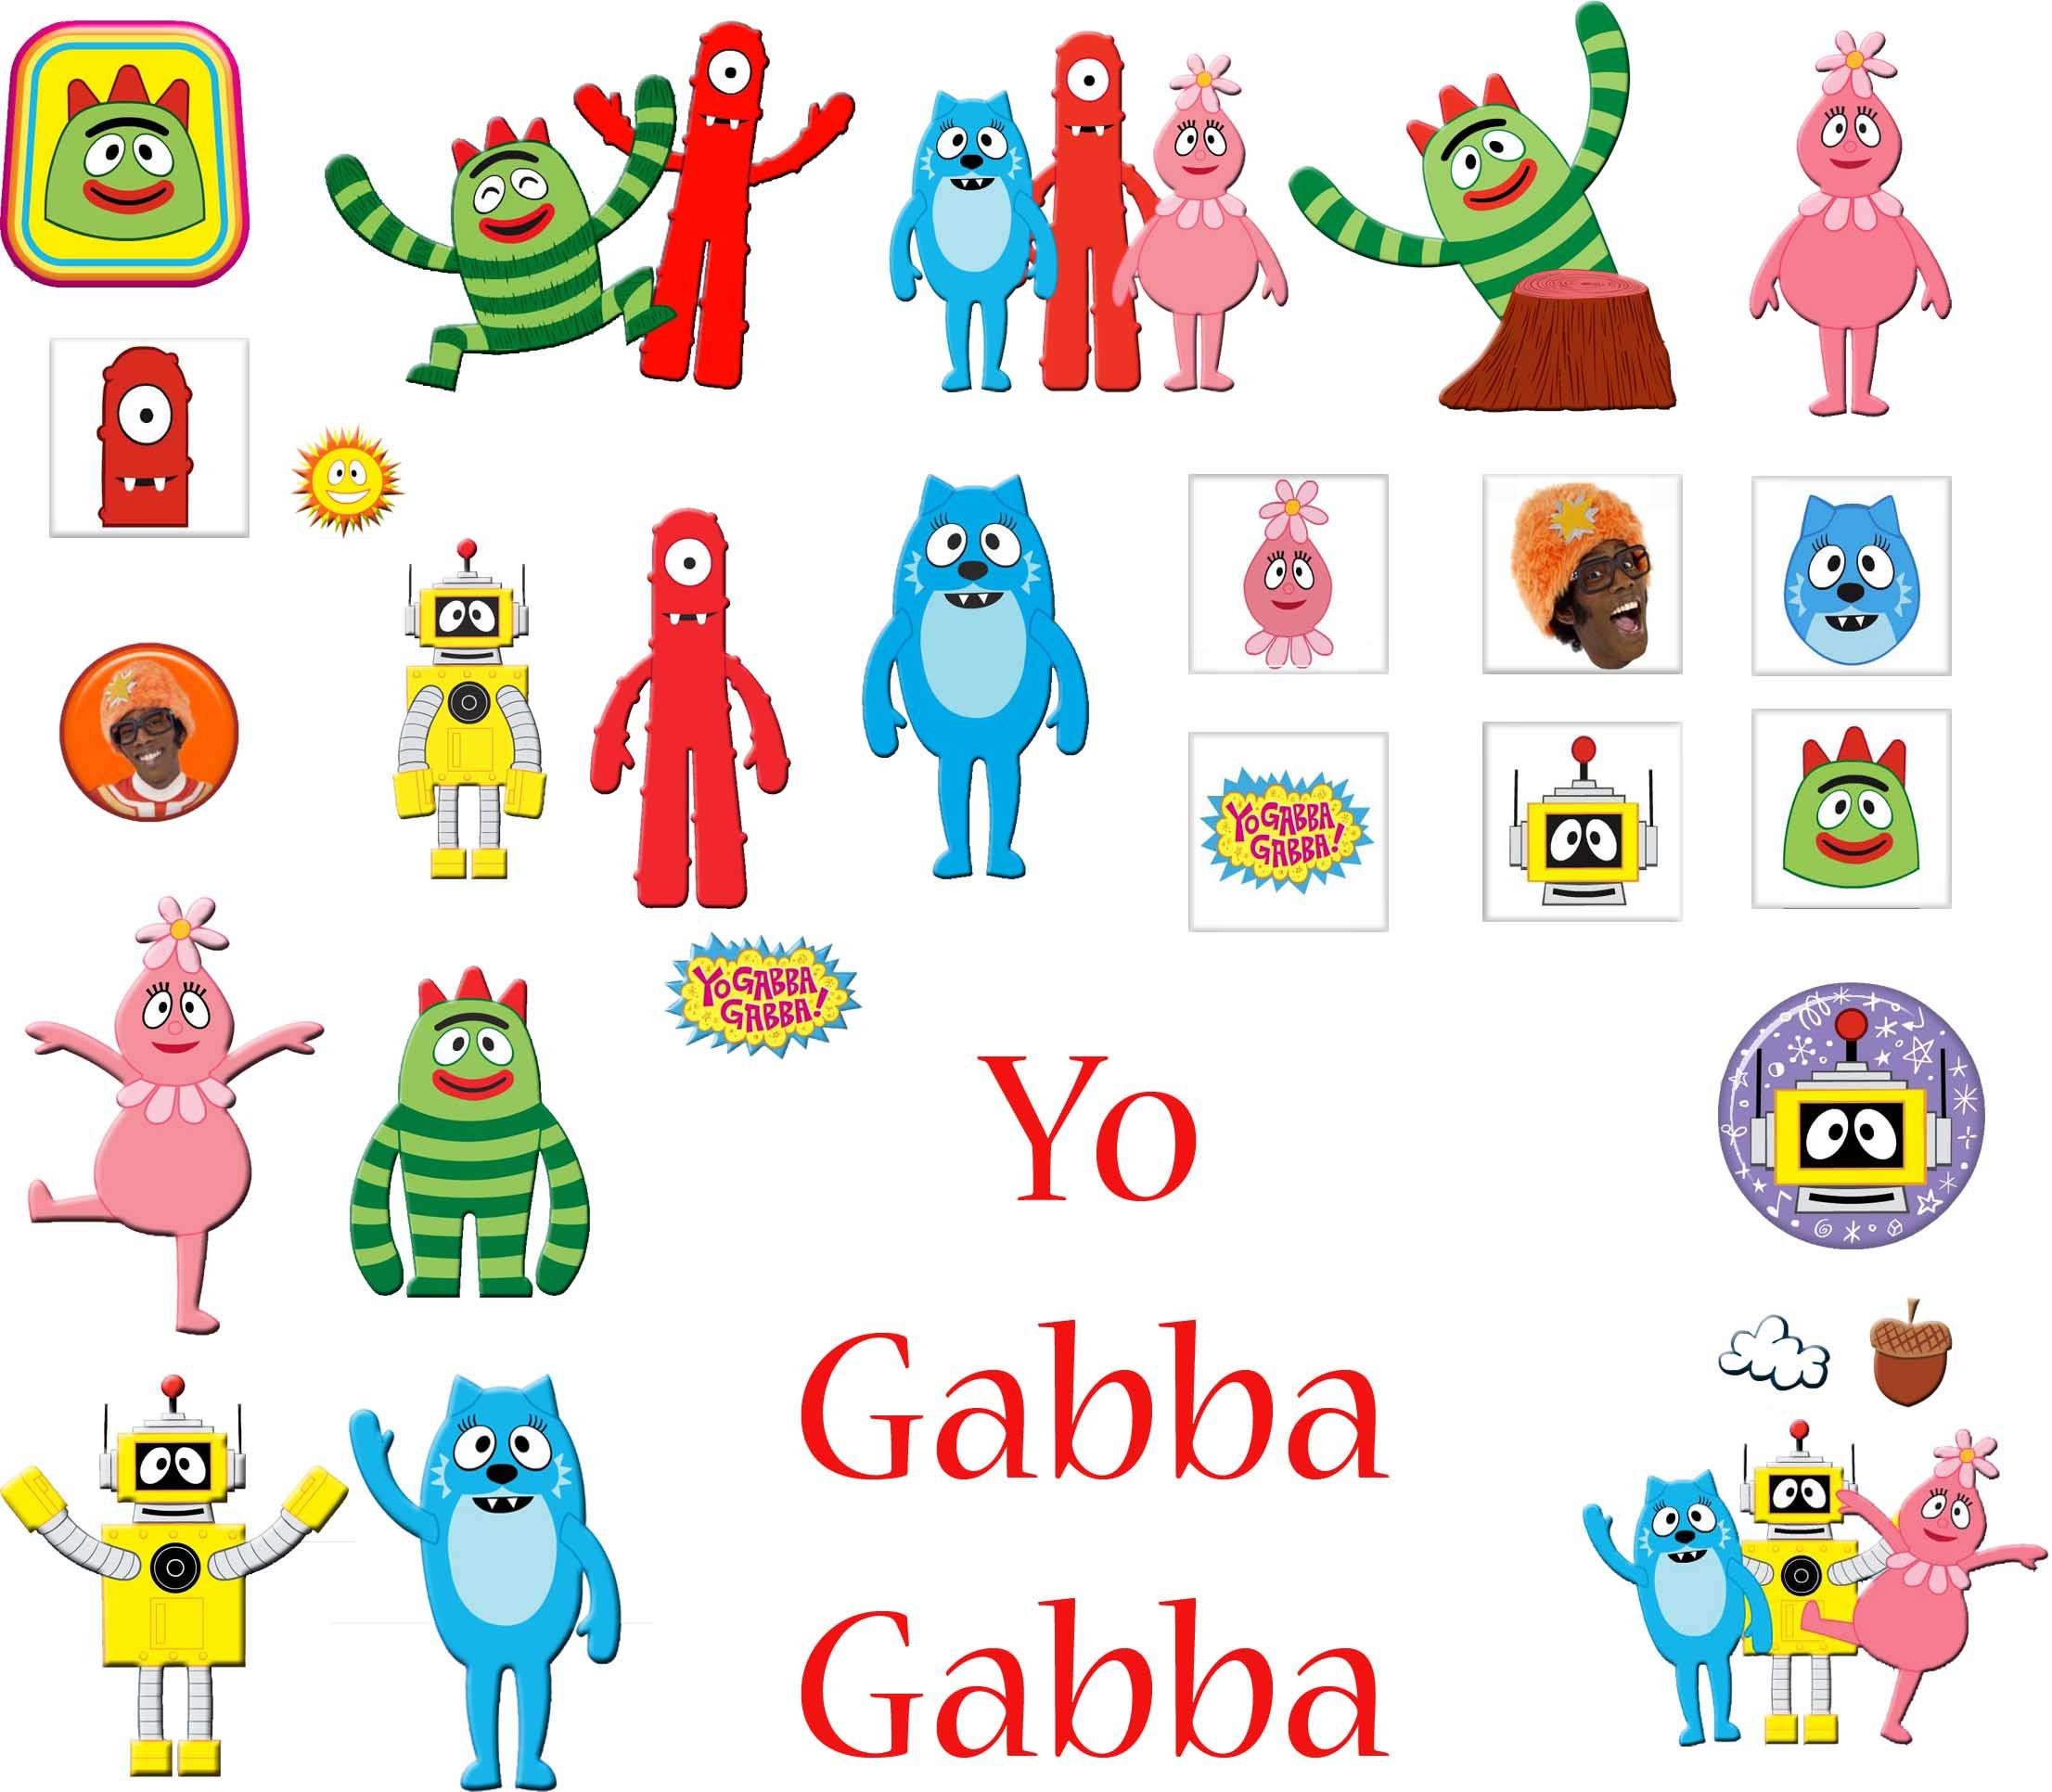 Yo Gabba Gabba Birthday Party Invitations | Gabba Friends | Yo Gabba ...